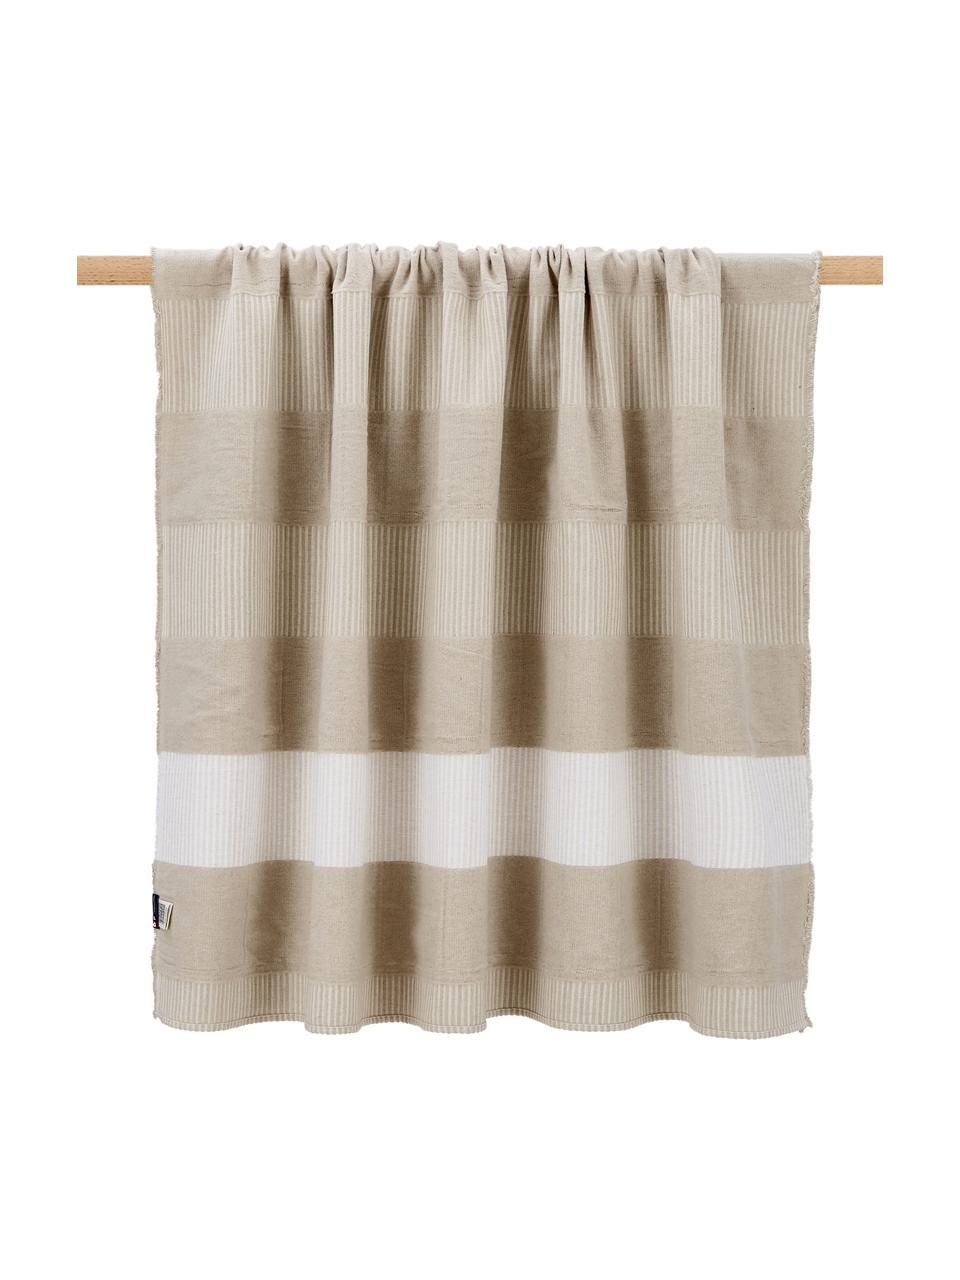 Manta de algodón Lino, 80%algodón, 15%lino, 5%viscosa, Beige, An 135 x L 200 cm